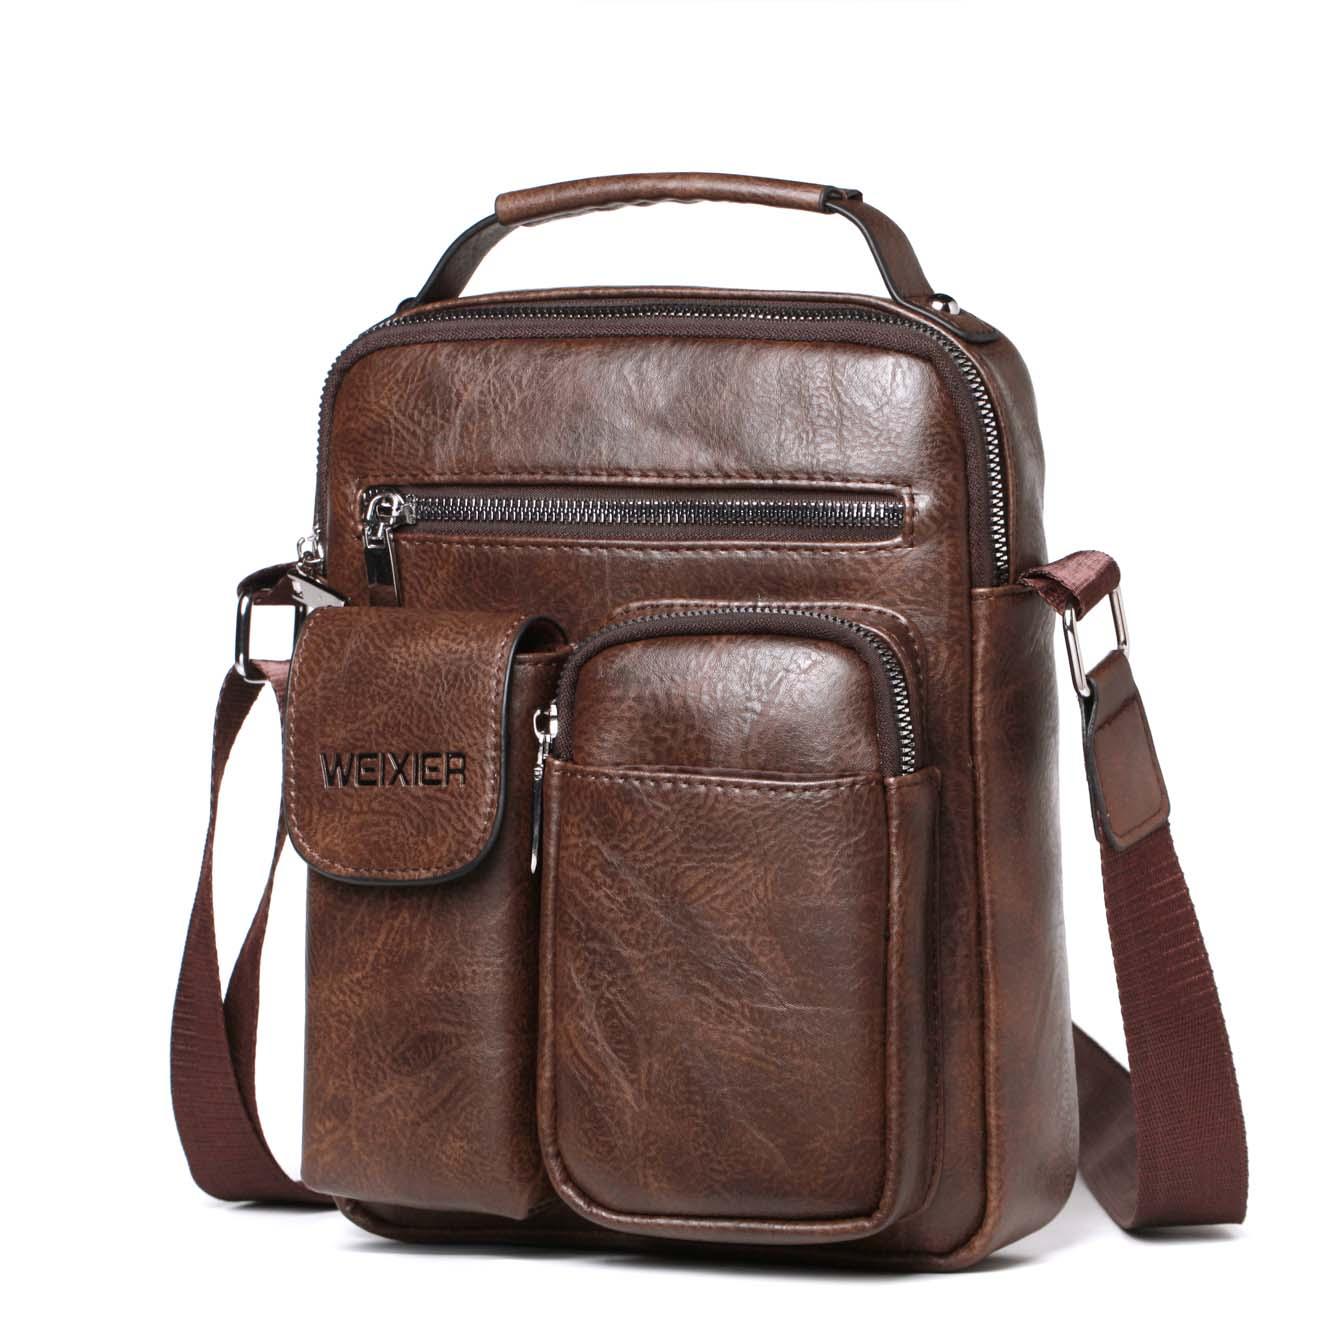 Fashion Men Shoulder Bag PU Leather Handbag Large Capacity Crossbody Bags Business Zipper Multifunctional Messenger Bag 8 Pocket